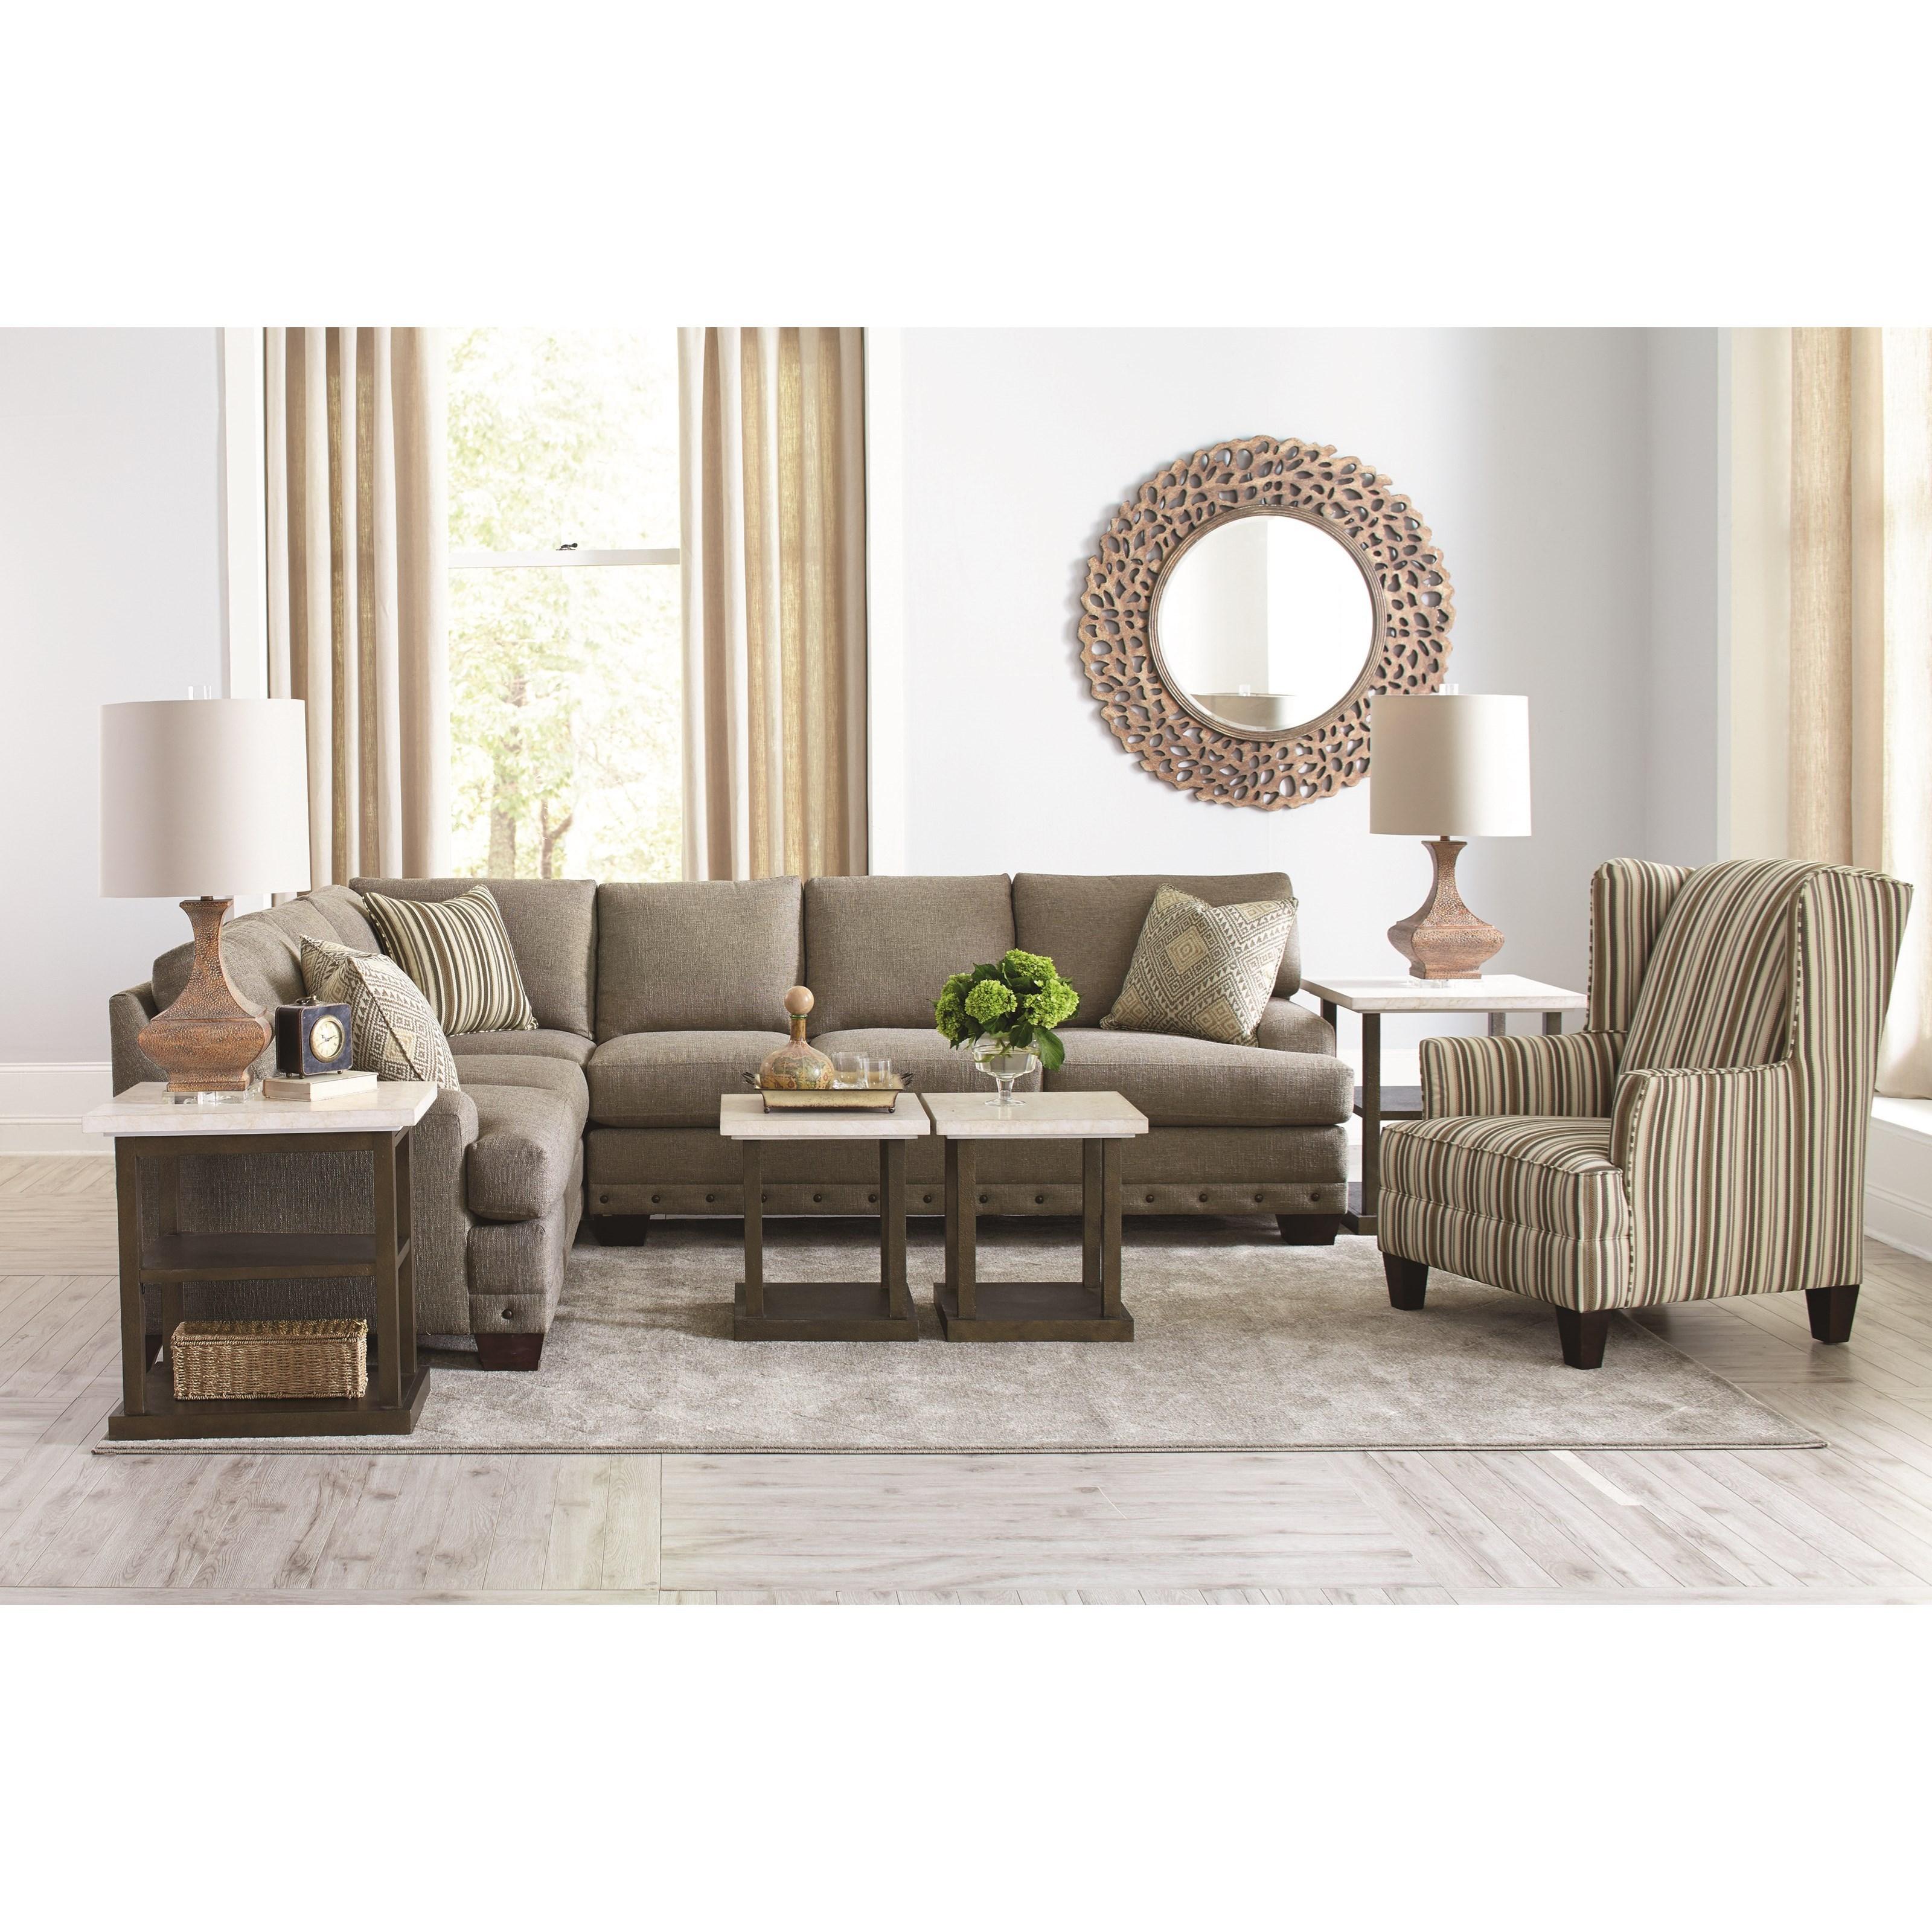 Bassett Cu 2 Carmine Five Seat Sectional Sofa John V Schultz Furniture Sofa Sectional